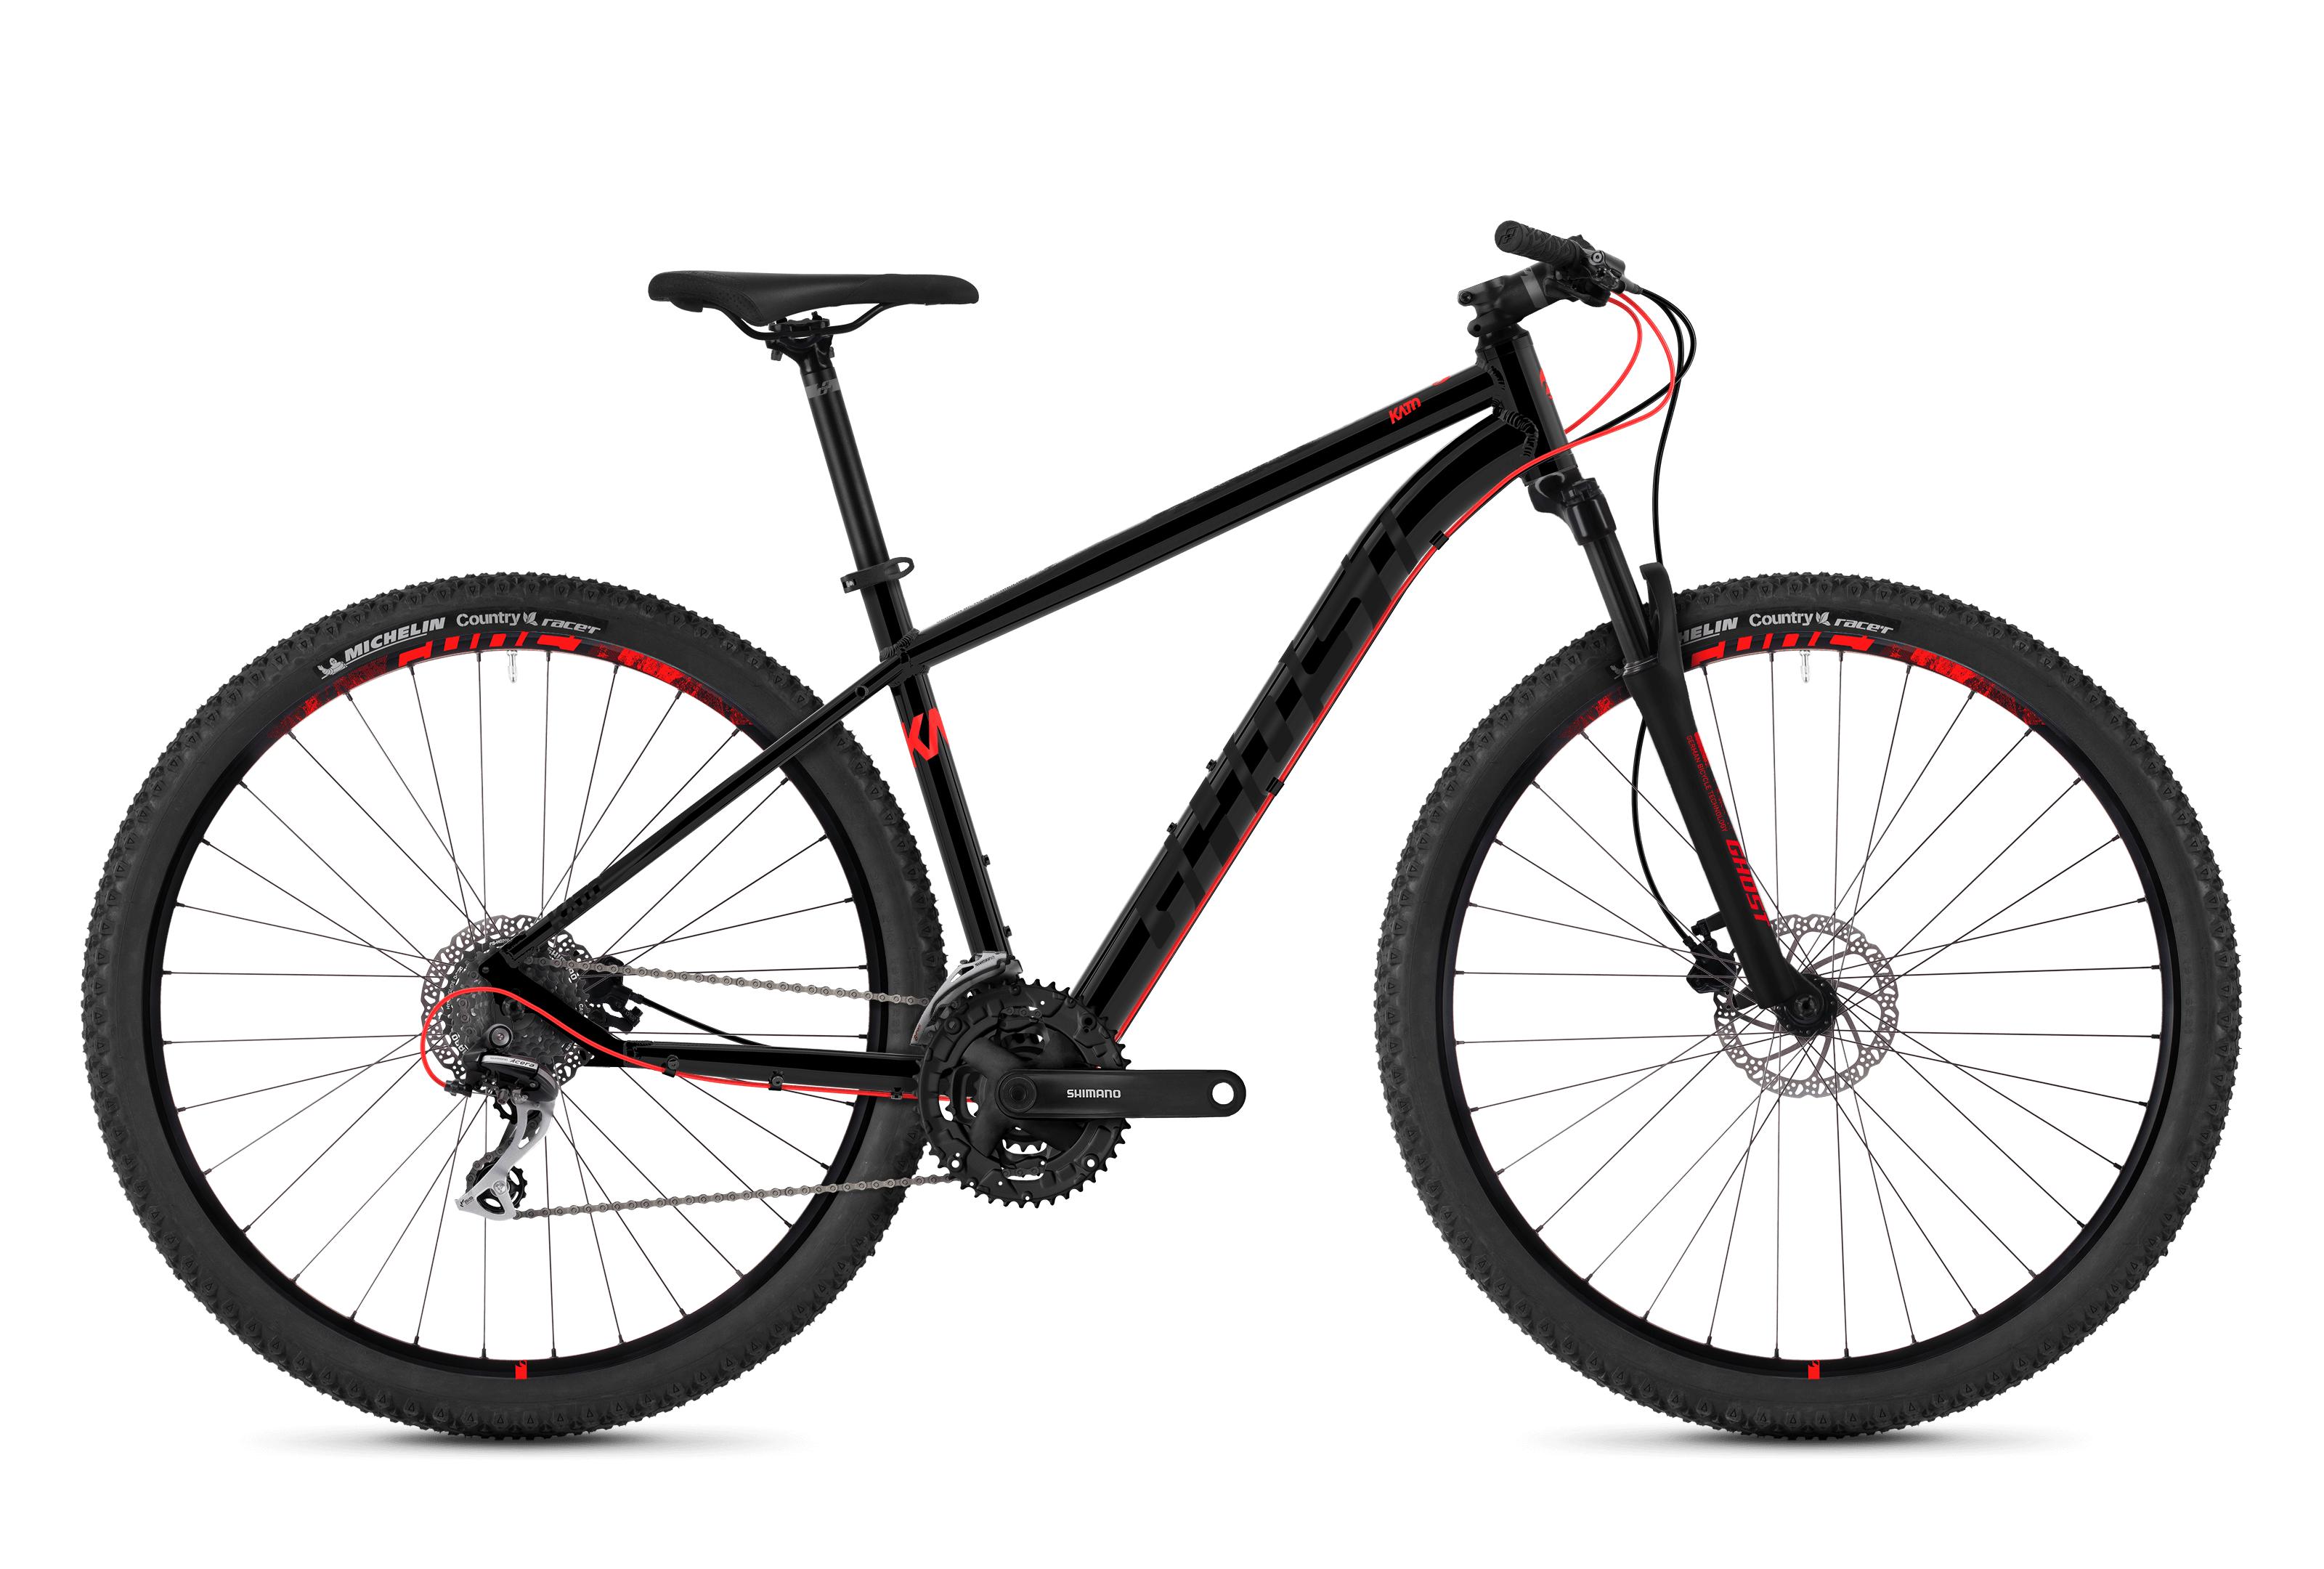 Horské kolo GHOST Kato 2.9 black / red XL 2018